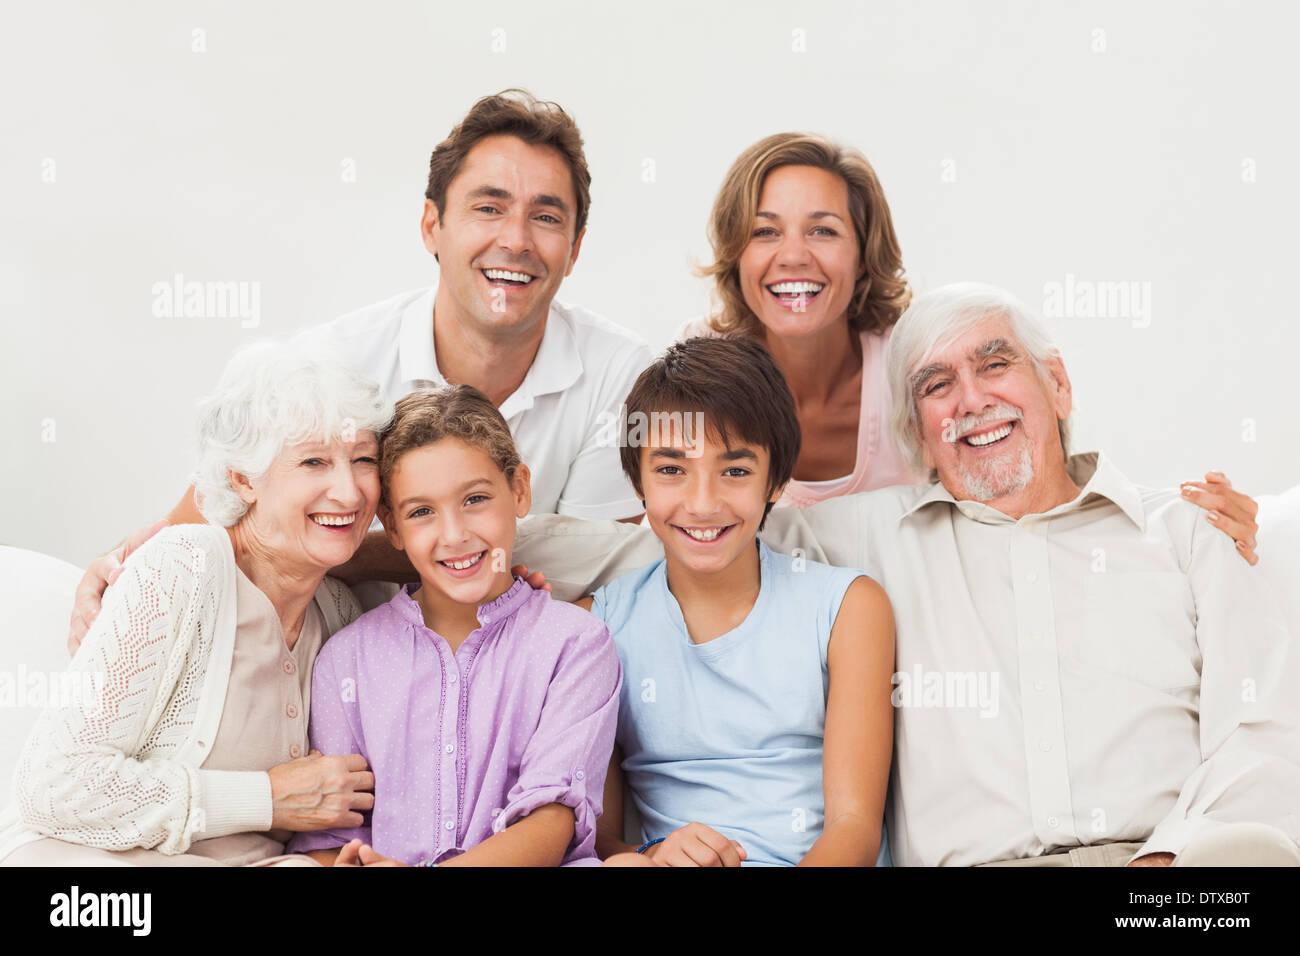 Extended family portrait - Stock Image